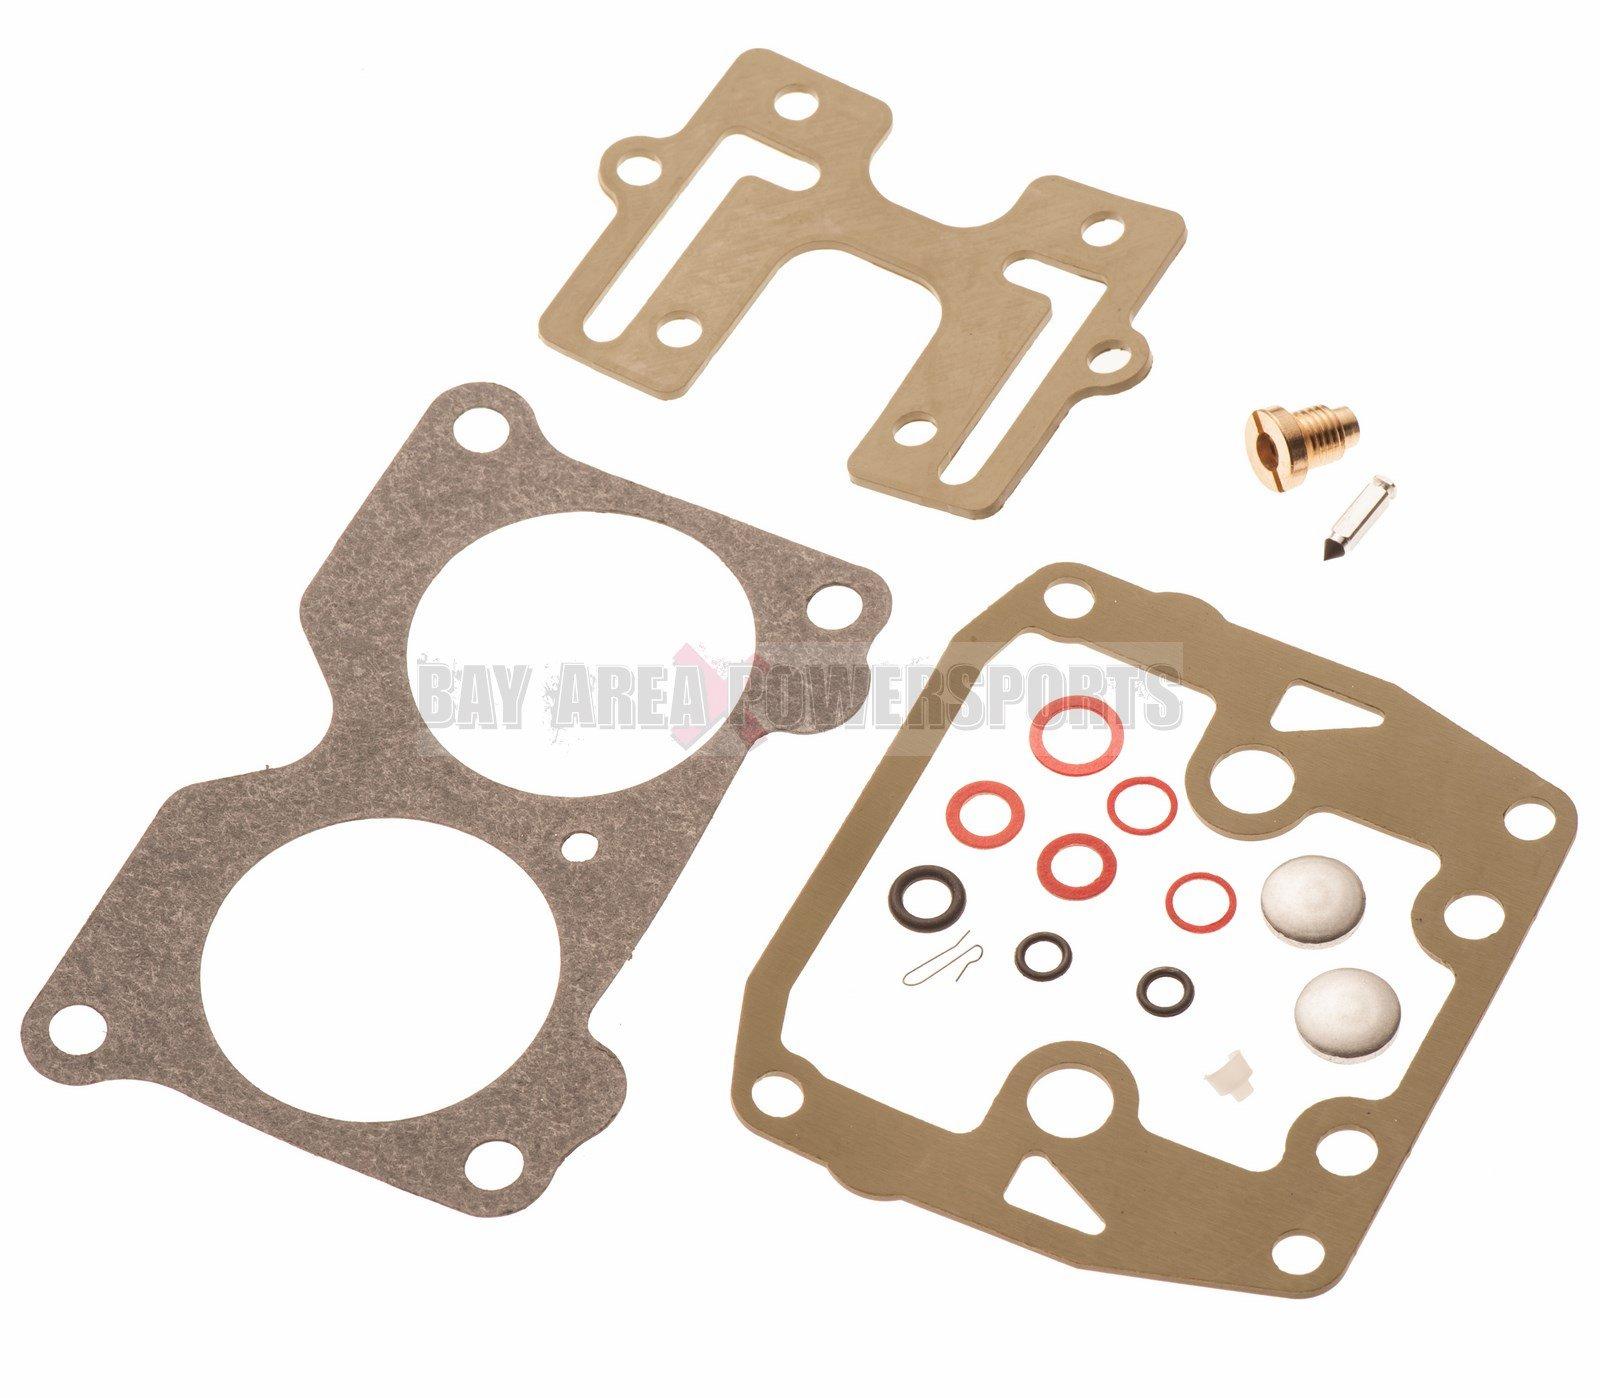 Johnson Evinrude Carb Carburetor Rebuild Kit 439076 V4 85 90 100 115 125 140 HP